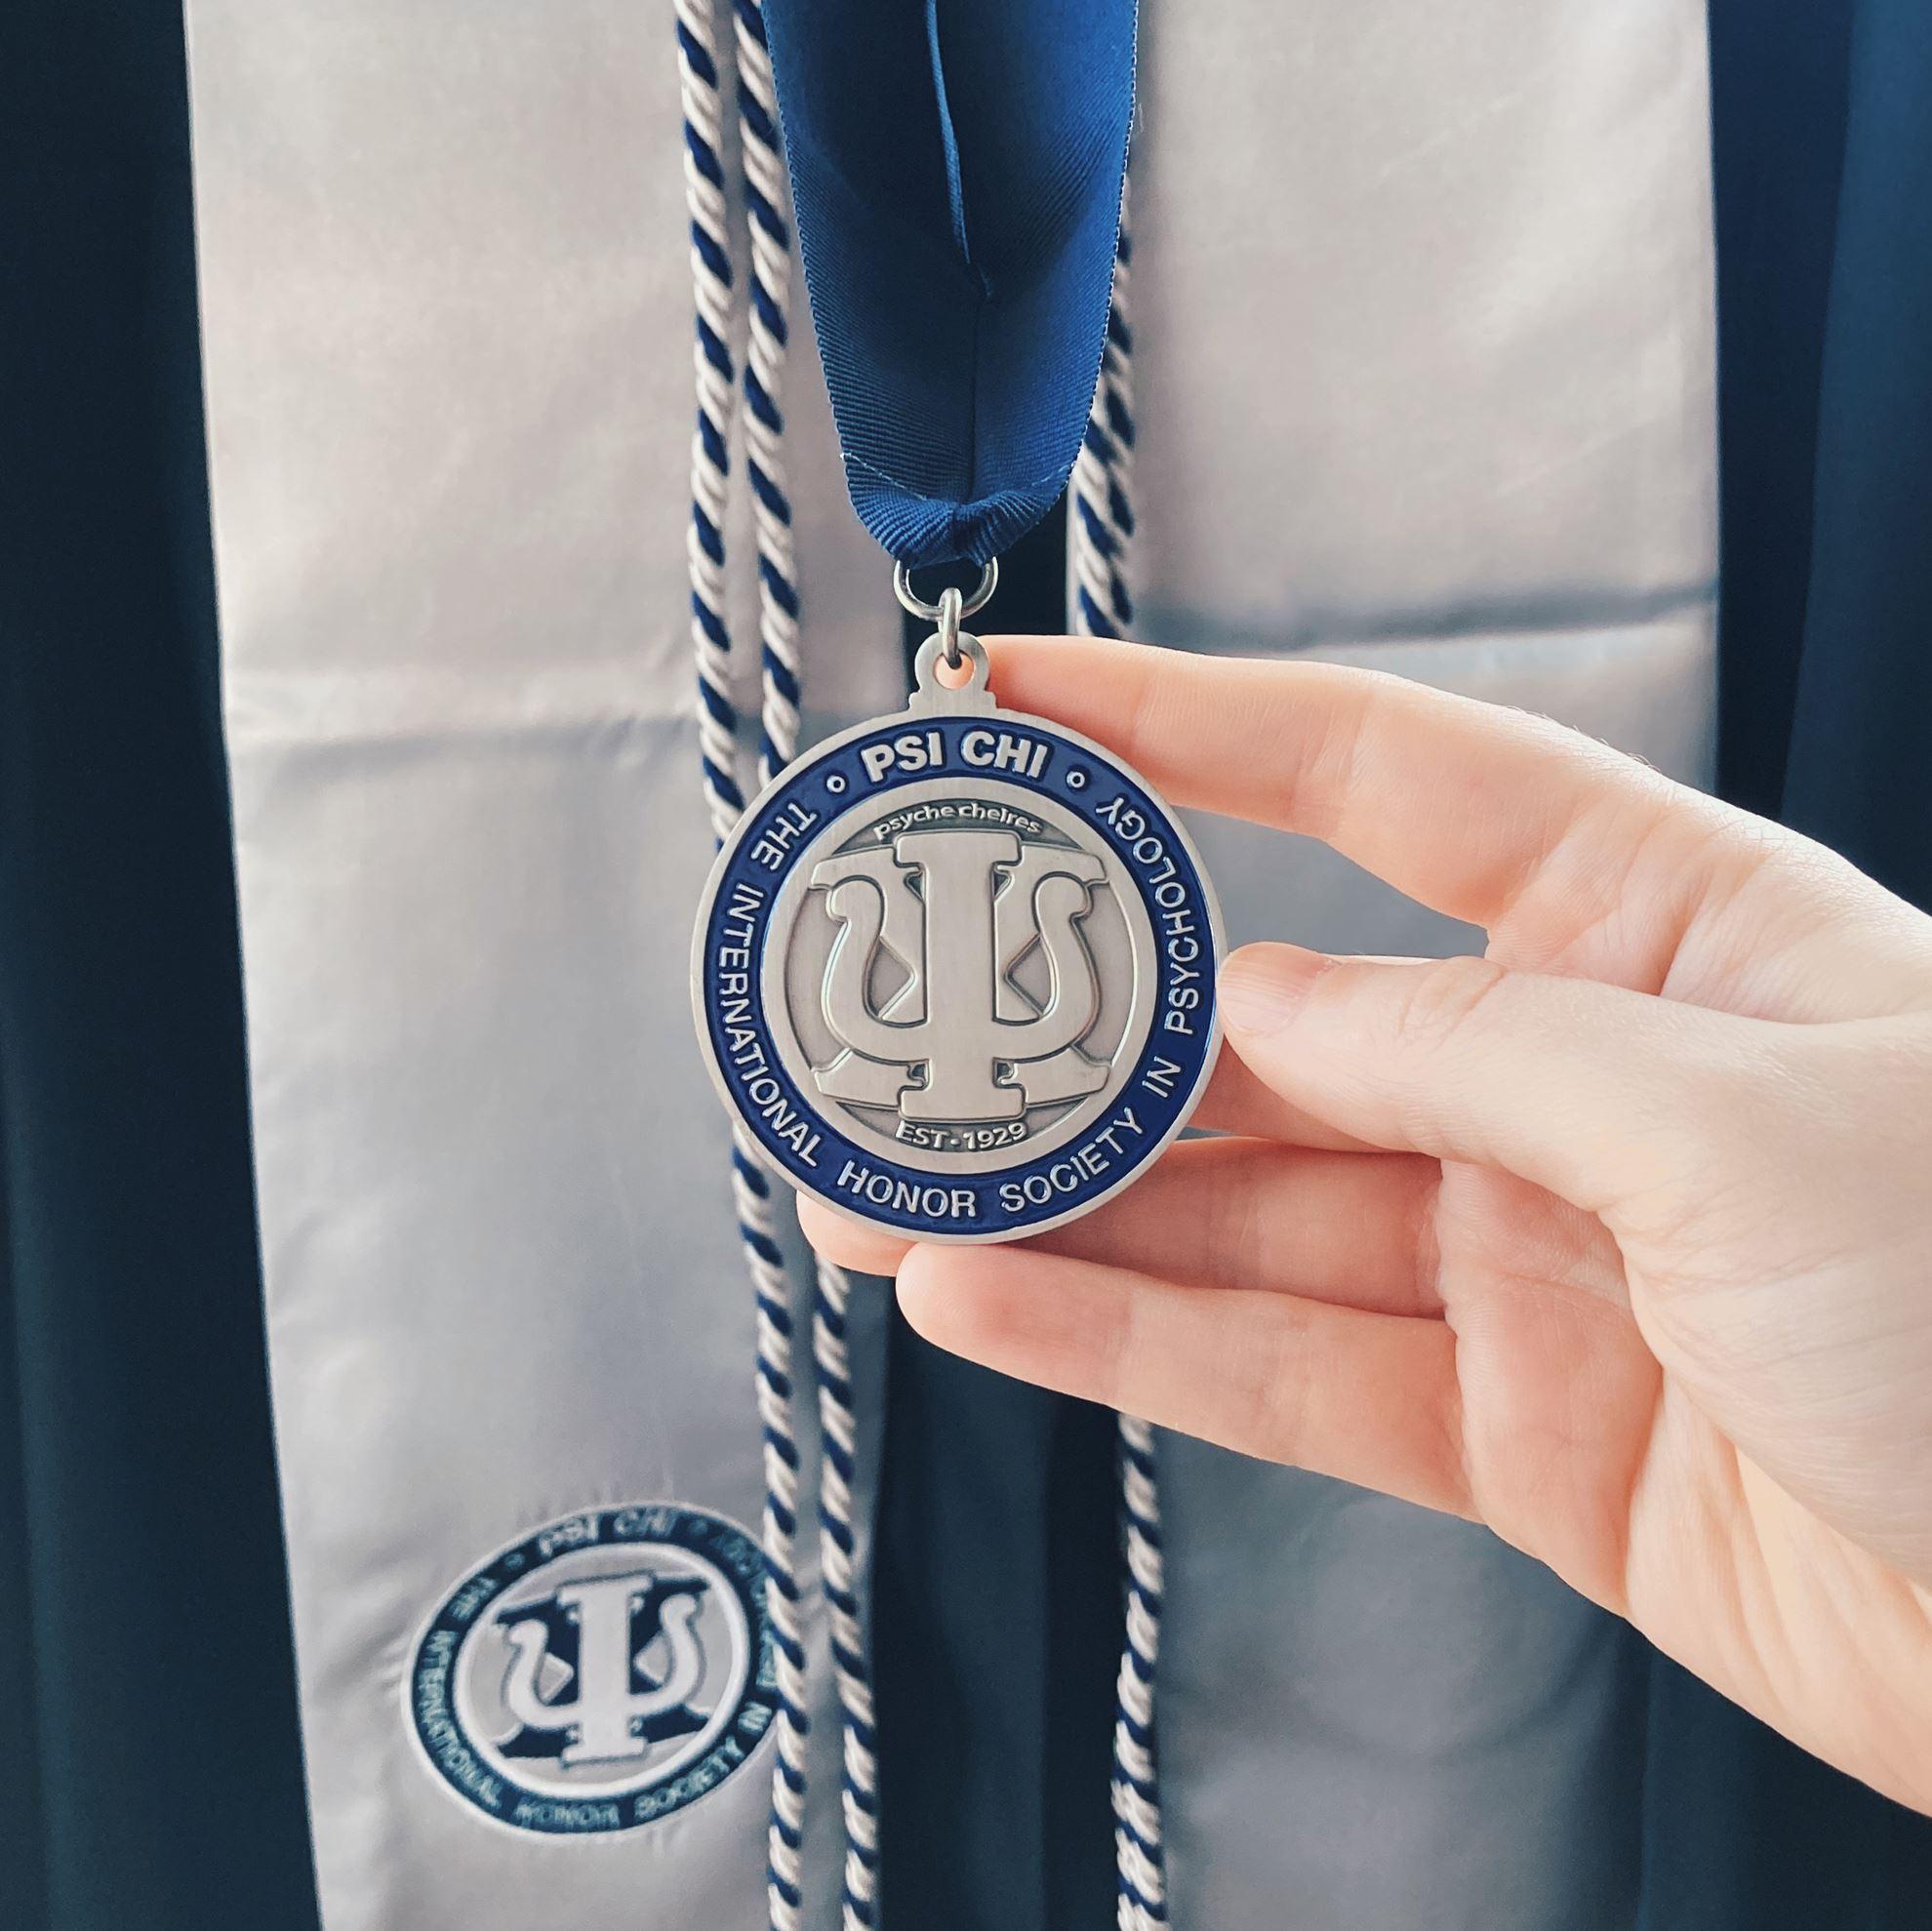 Detail of Psi Chi Platinum Medallion